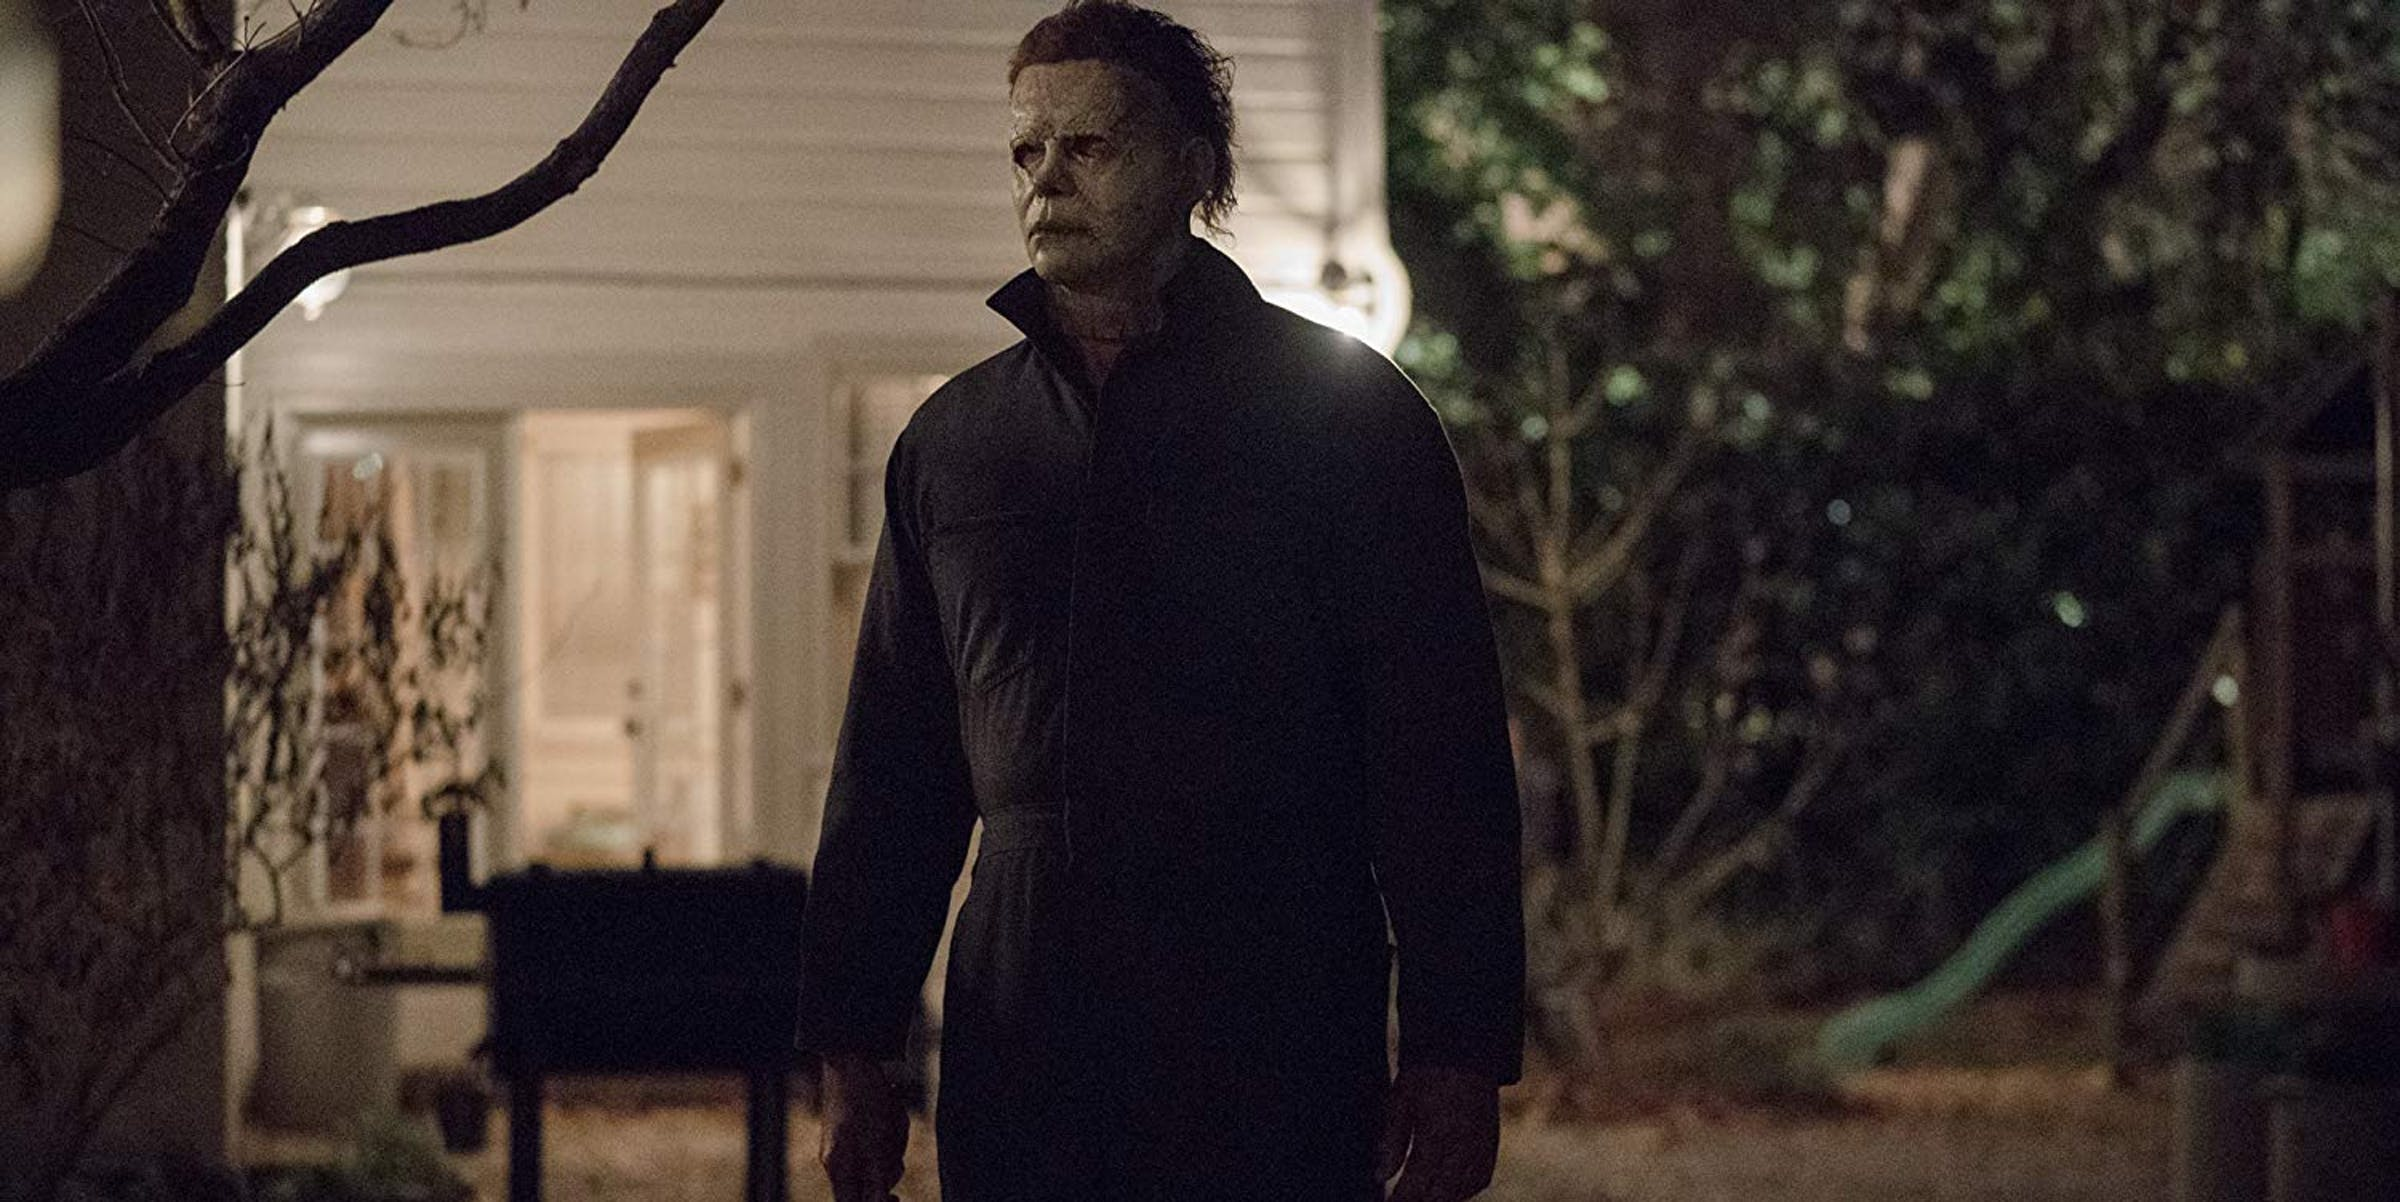 Halloween Michael Meyers